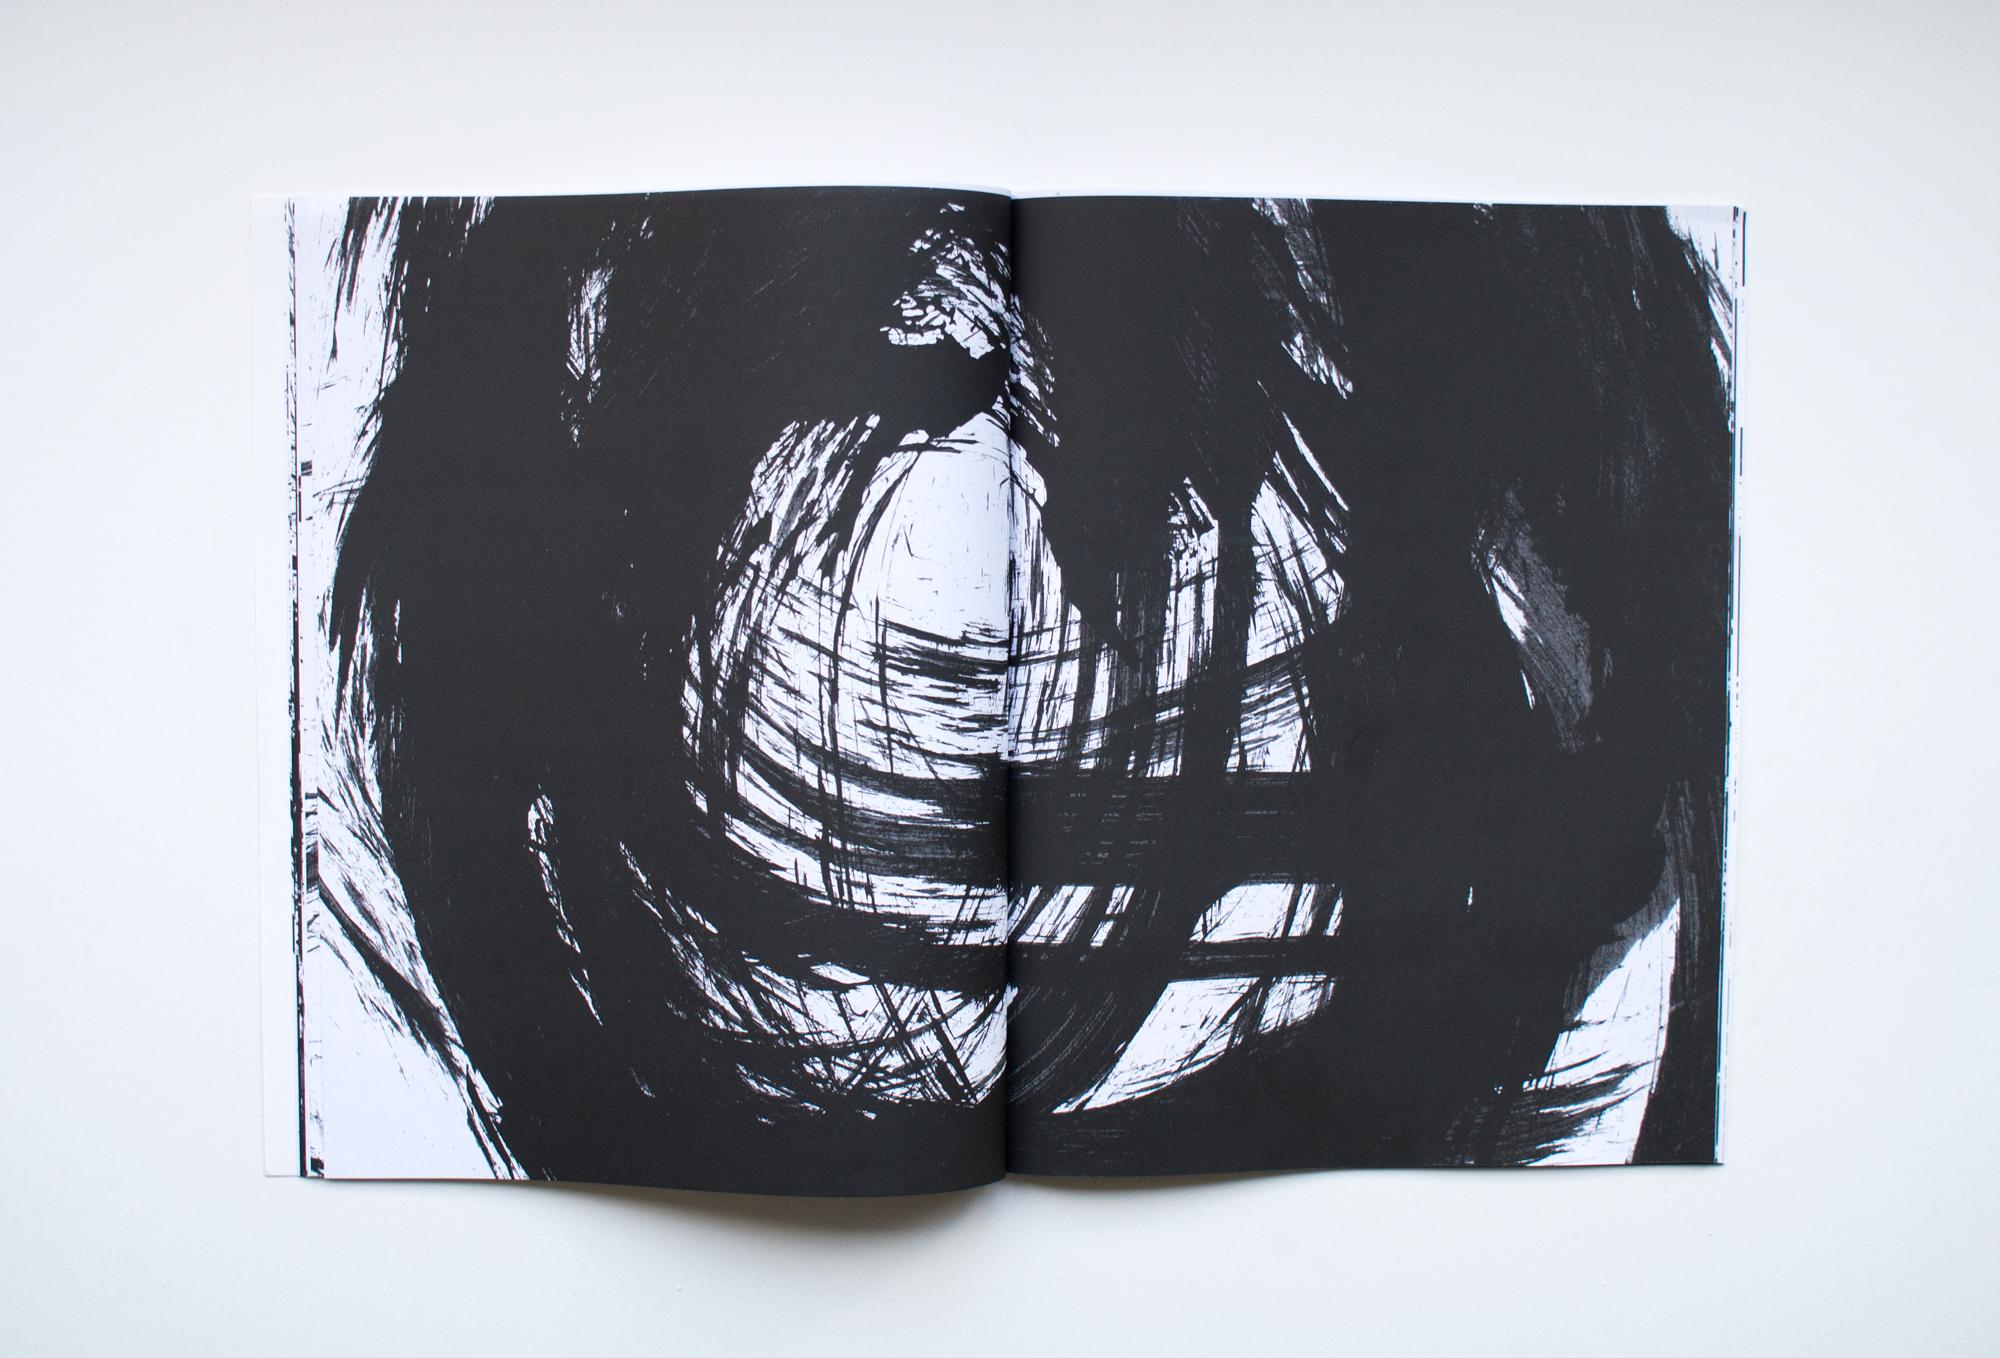 "Title: Judges 16:18 Artist: Jarrett Key Year: 2018 Medium: Perfect bound book Dimensions: 11"" x 8.5"" Price: $80, edition of 50"